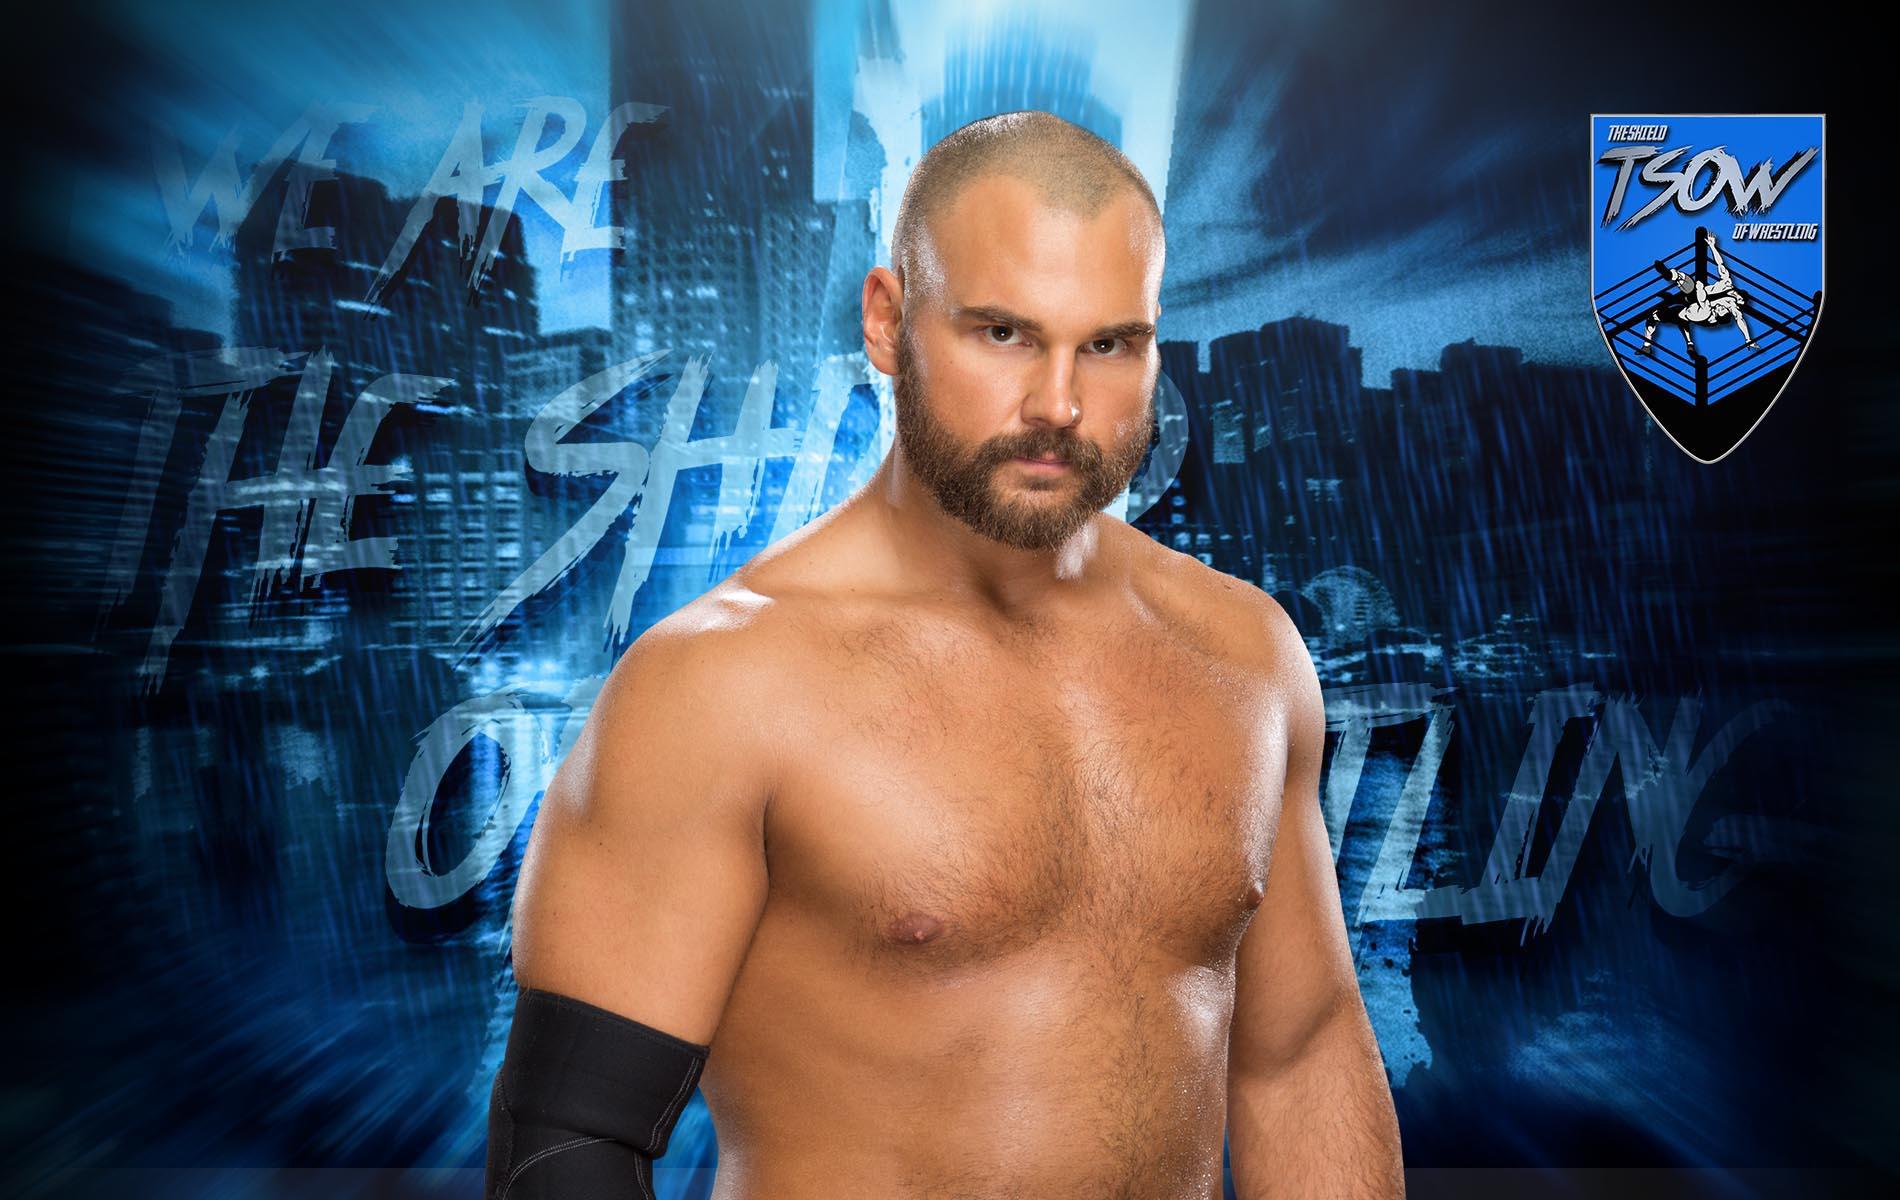 Dax Harwood ricorda l'alleanza con Randy Orton in WWE